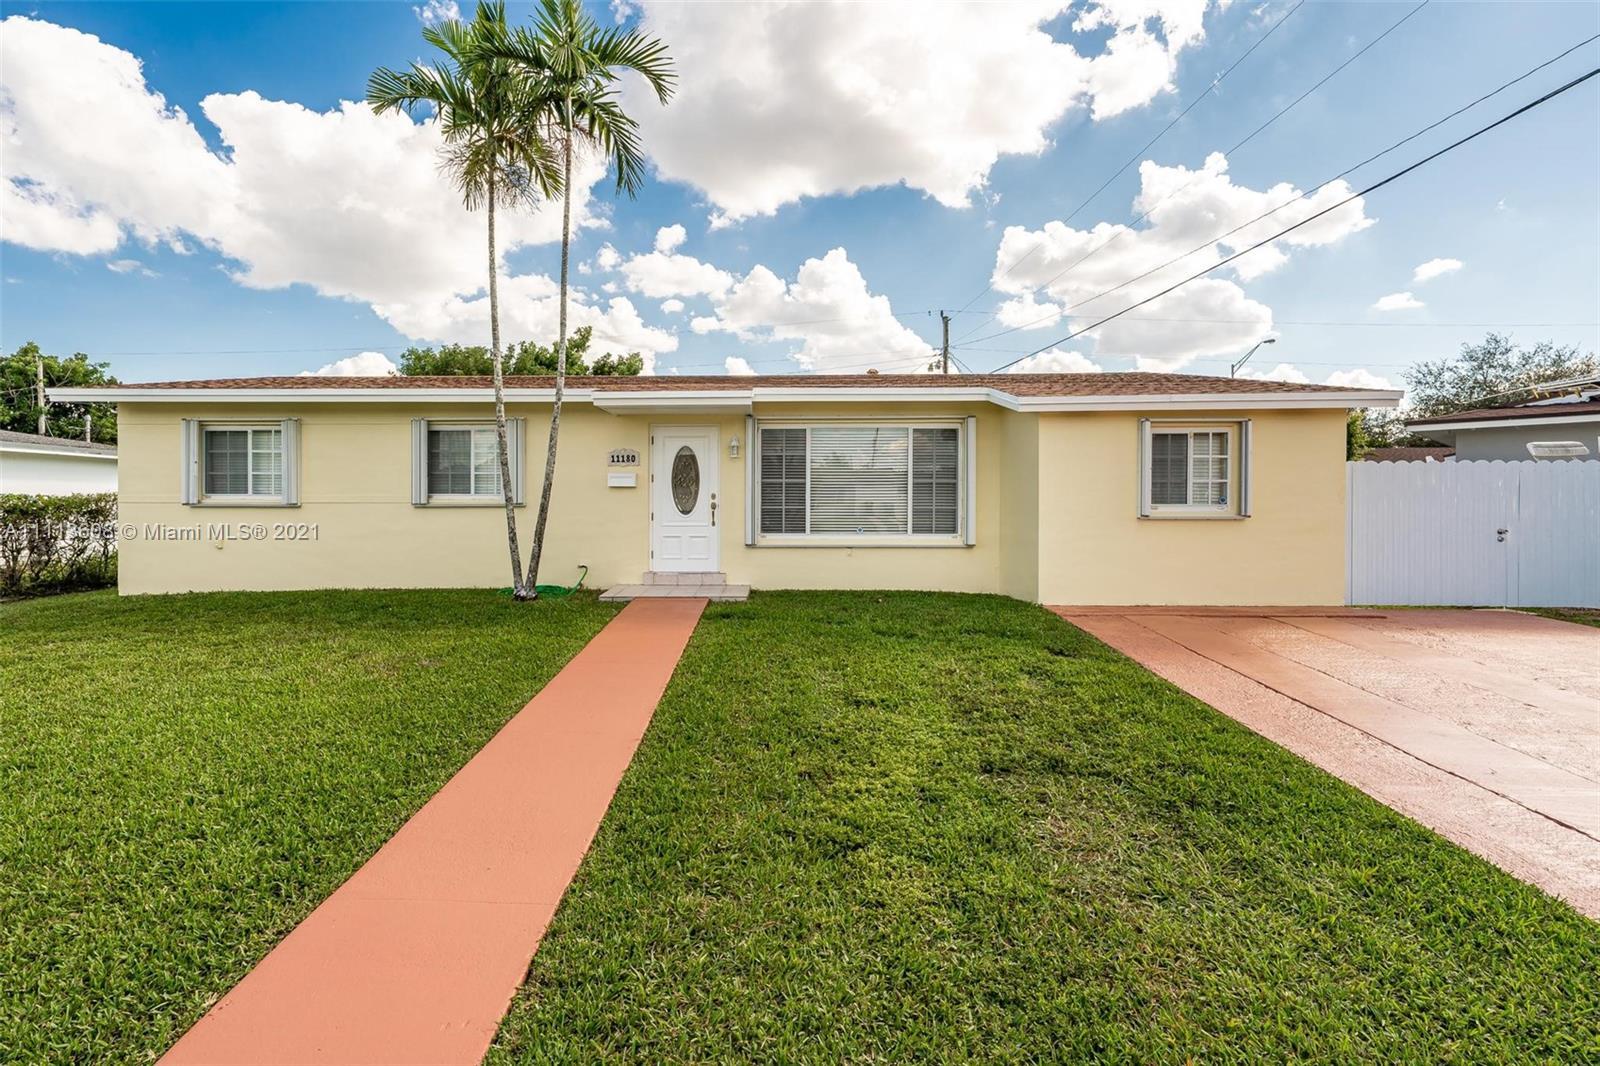 Snapper Creek - 11180 SW 61st Ter, Miami, FL 33173